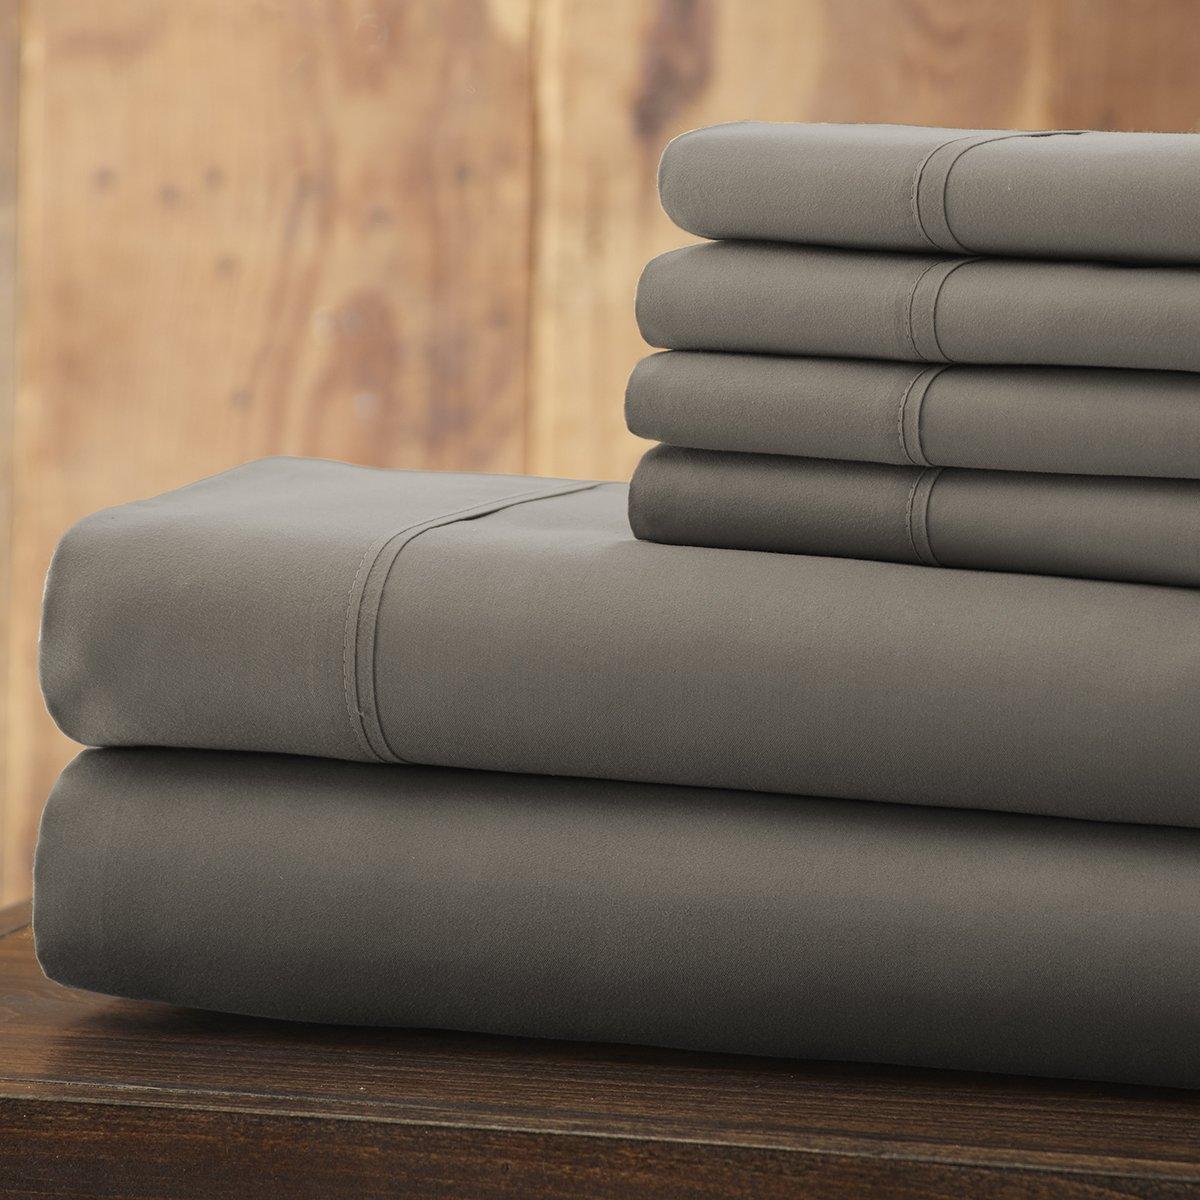 Spirit Linen 6 Piece Everyday Essentials 1800 Series Sheet Set, Queen, Grey